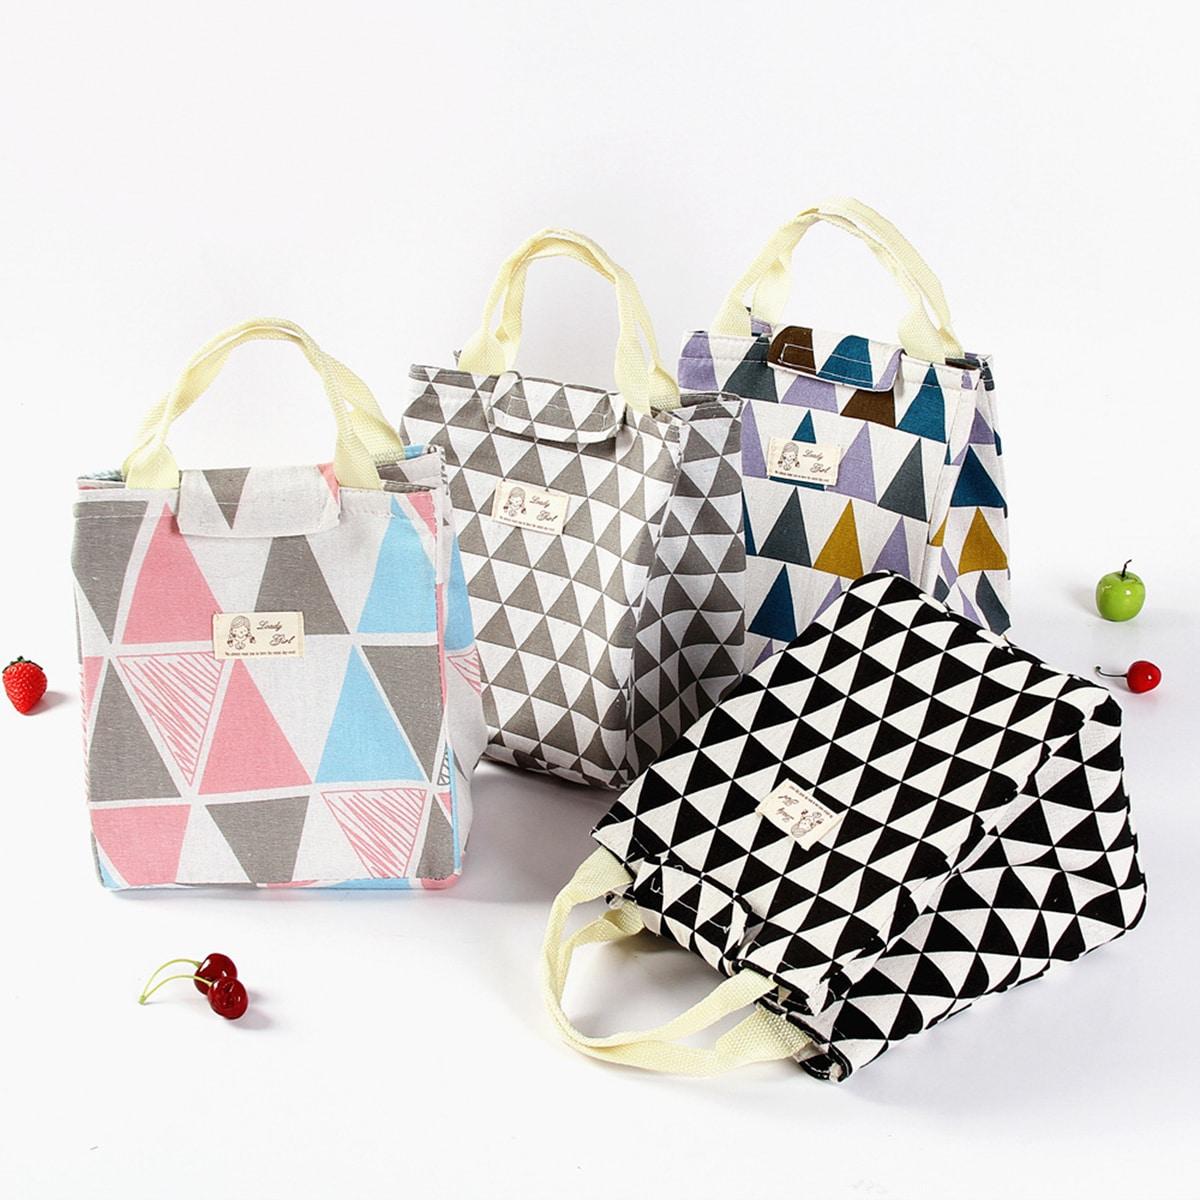 SHEIN / 1pc Geometric Pattern Lunch Box Bag